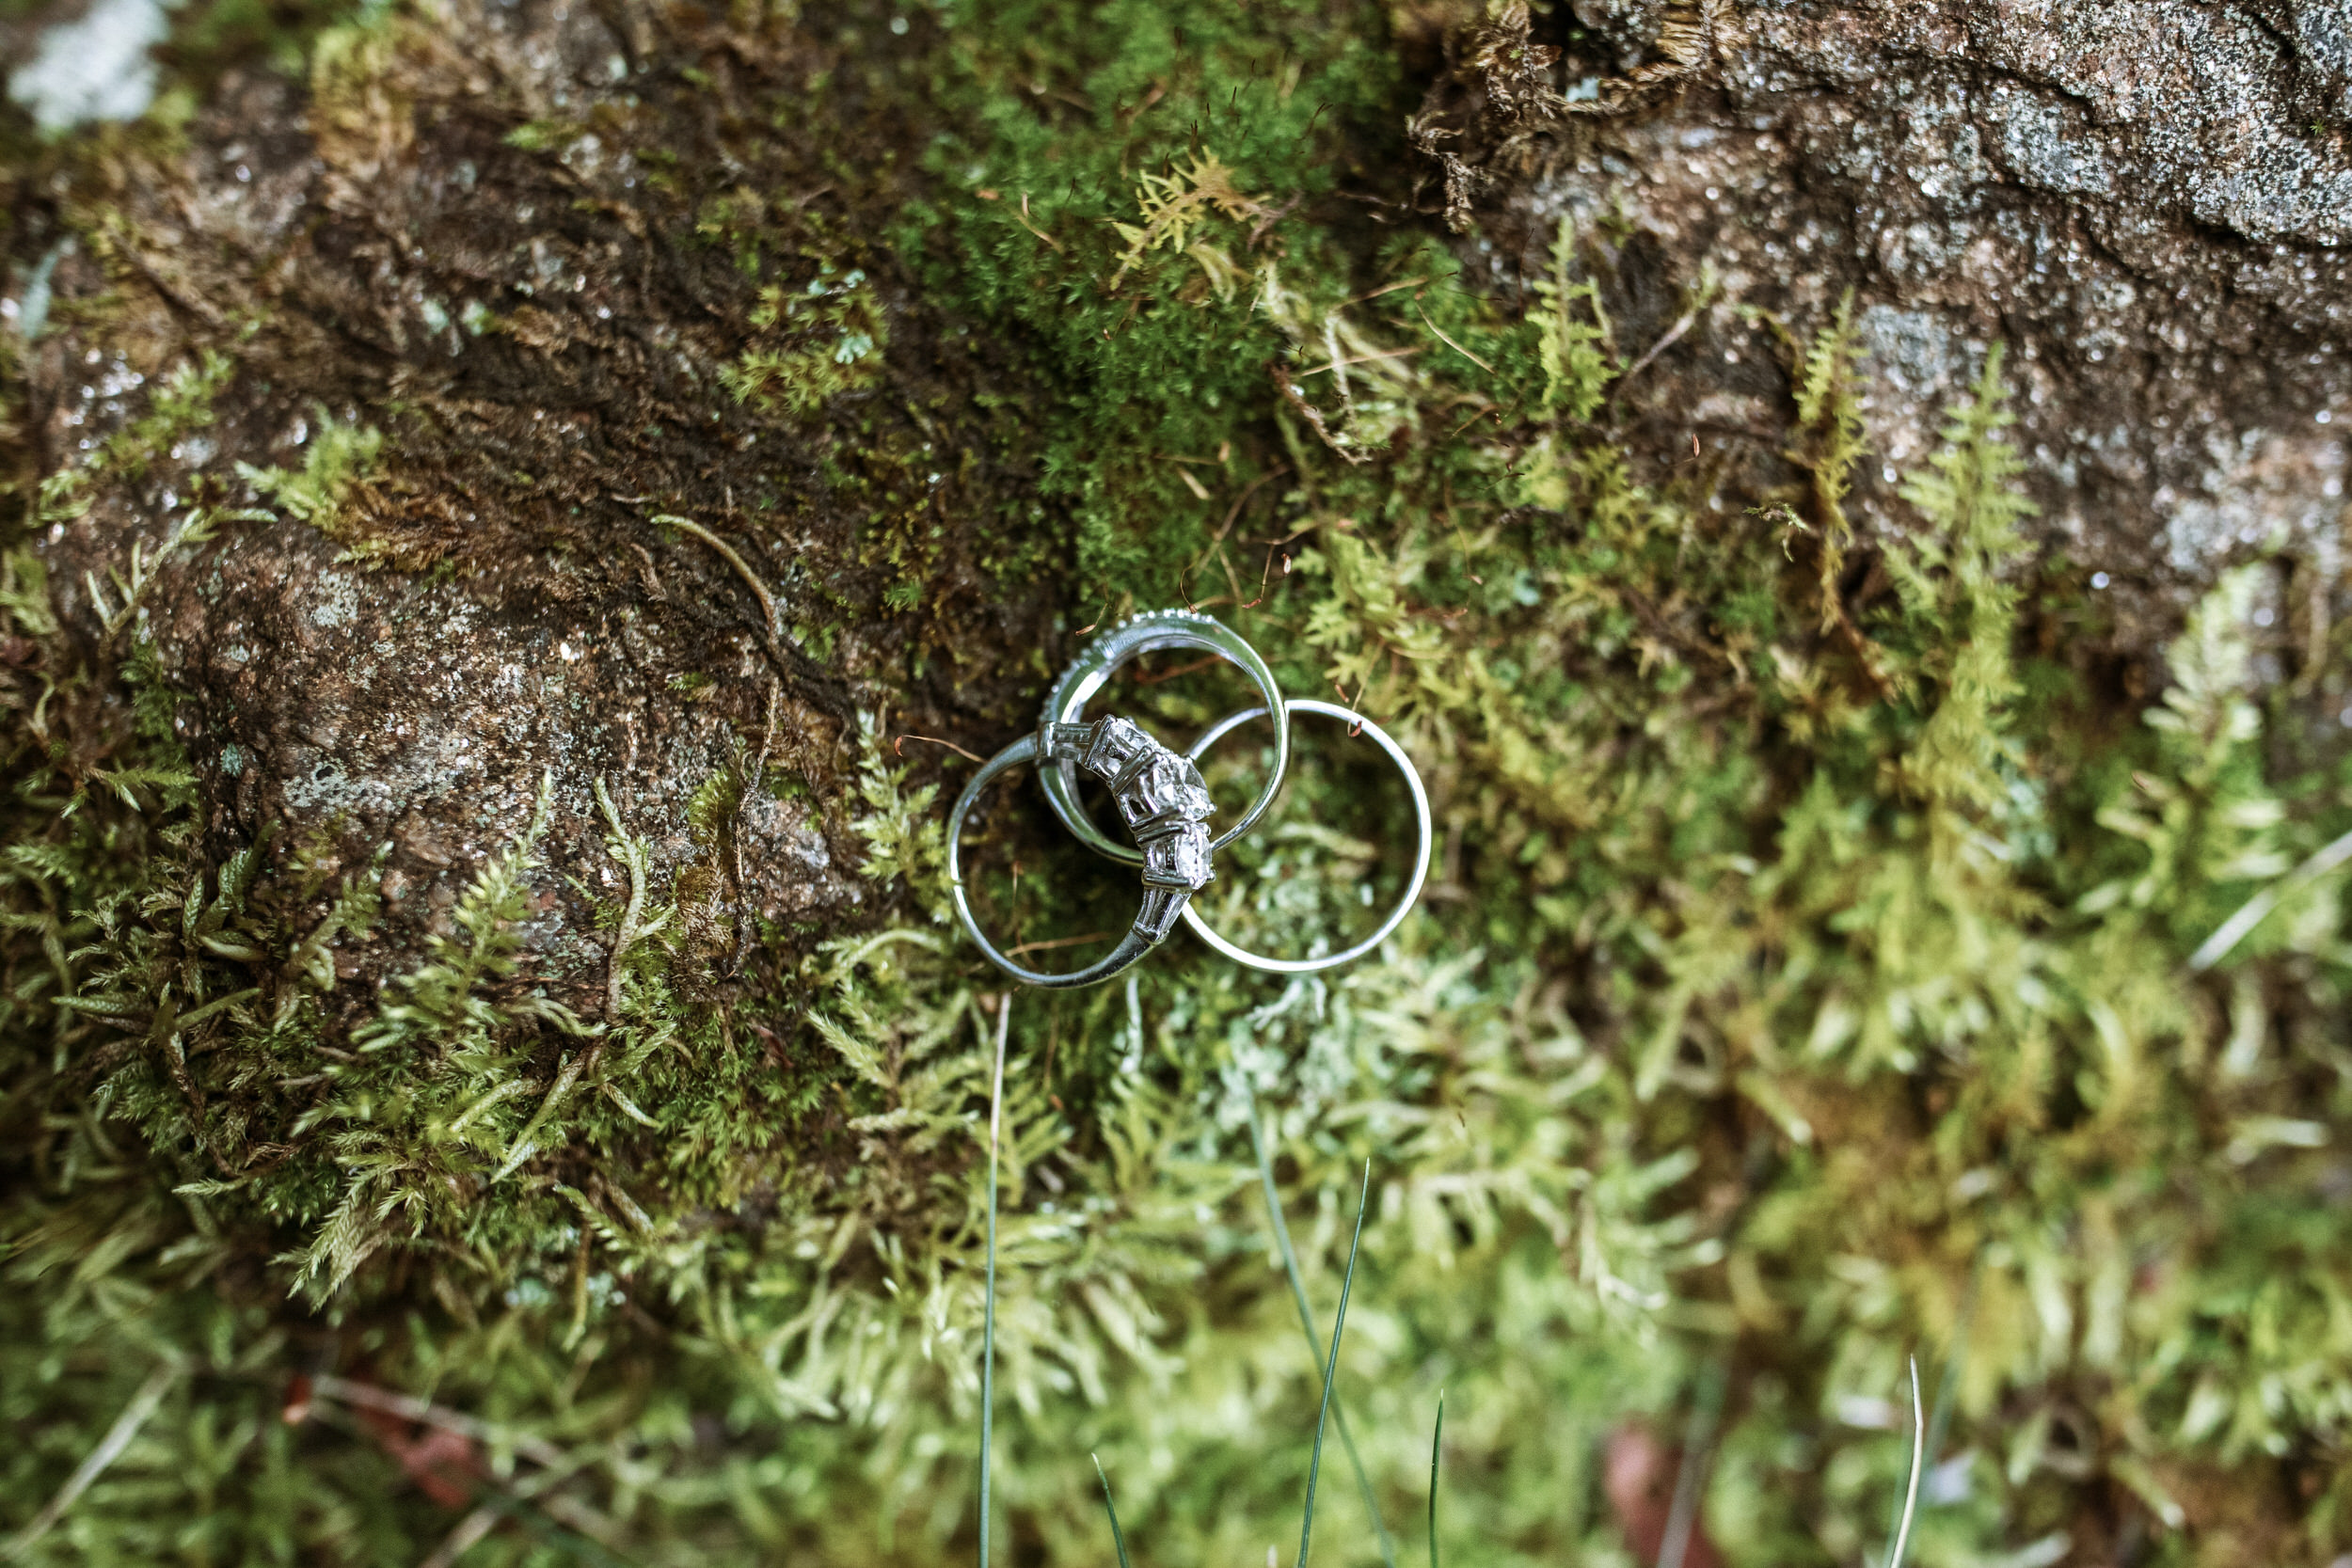 2. Groom's Morning - Cole + Rachel's Great Smoky Mountain National Park Elopement-41.jpg